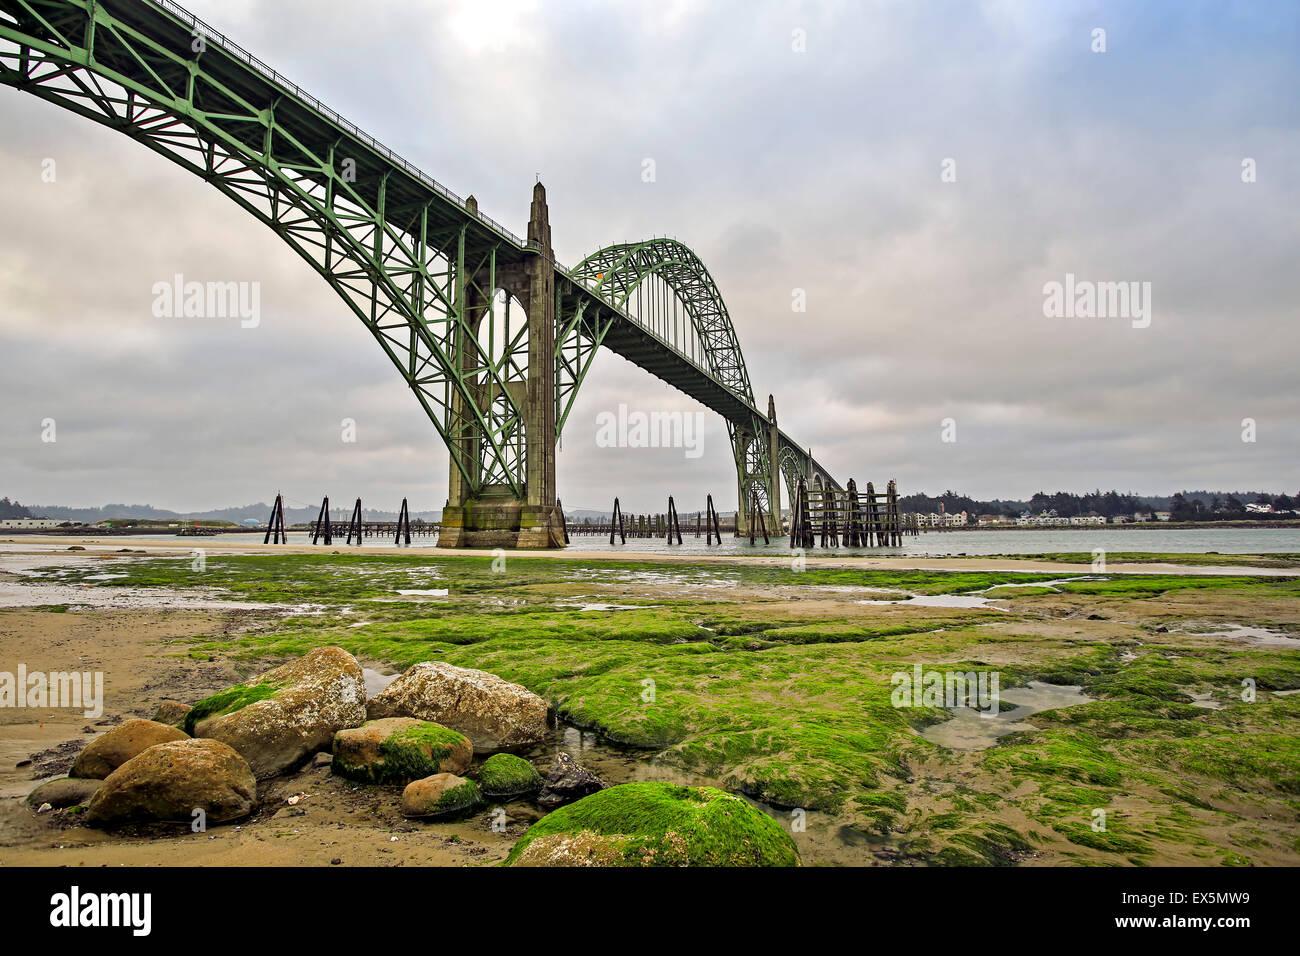 Rocks, moss and Yaquina Bay Bridge, Newport, Oregon USA - Stock Image